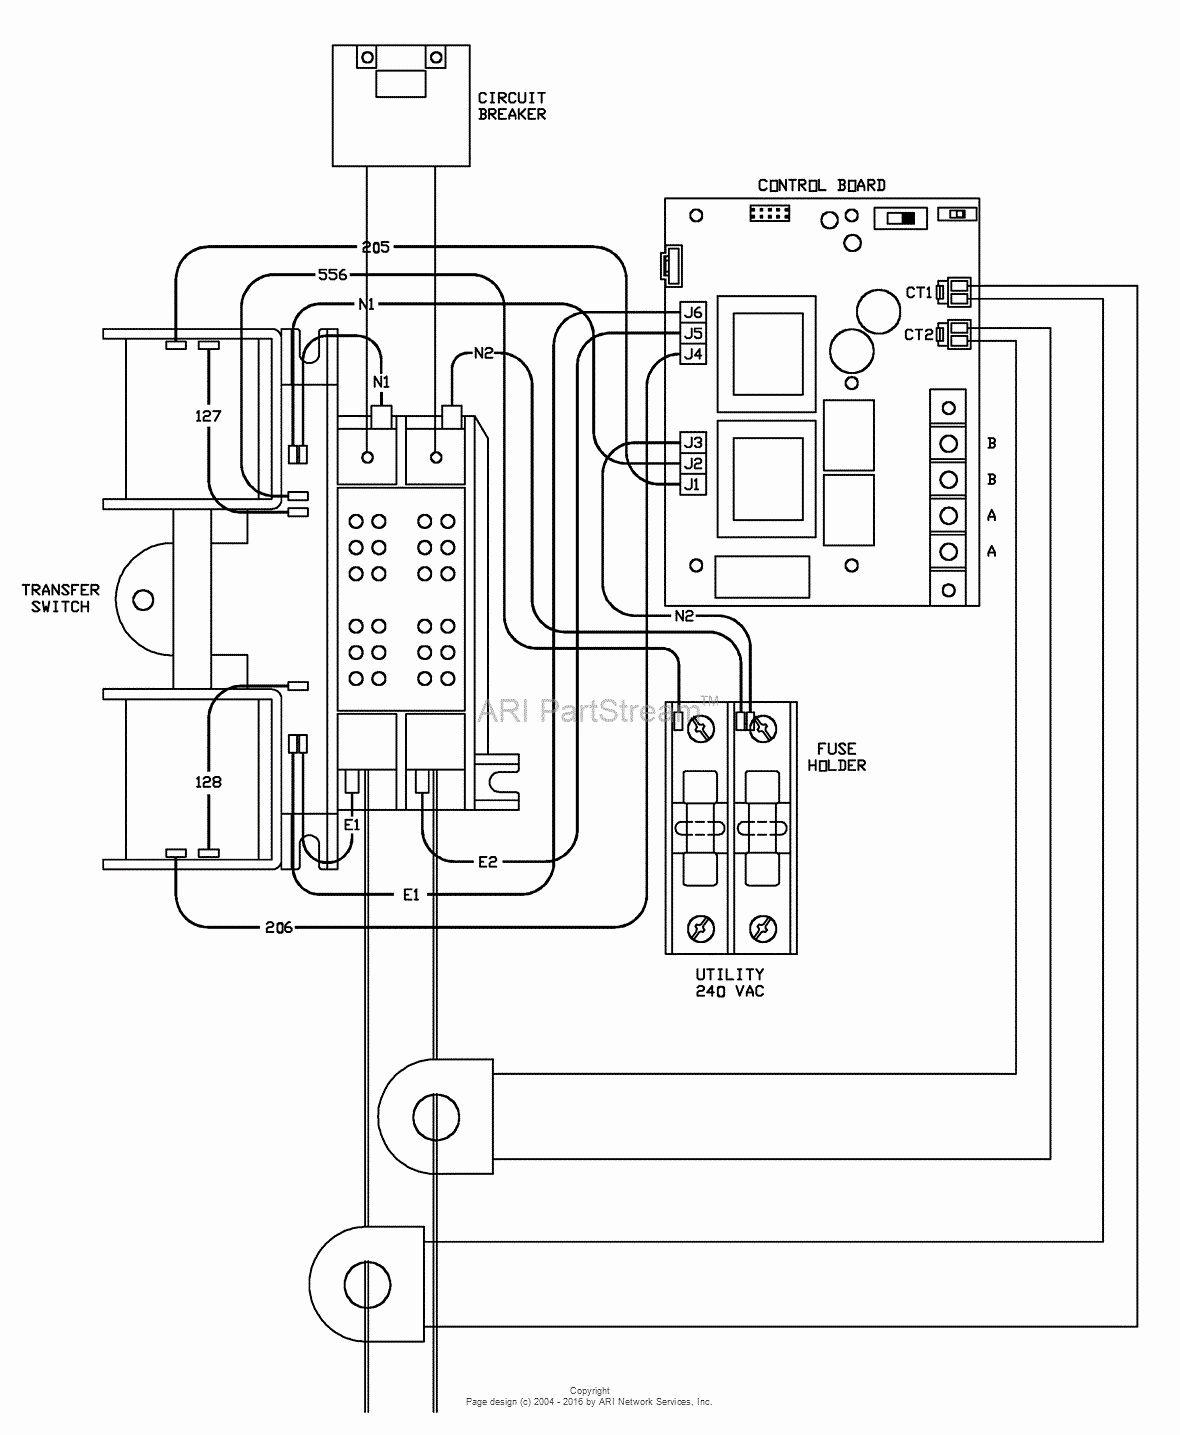 Ats Wiring Diagram from i0.wp.com